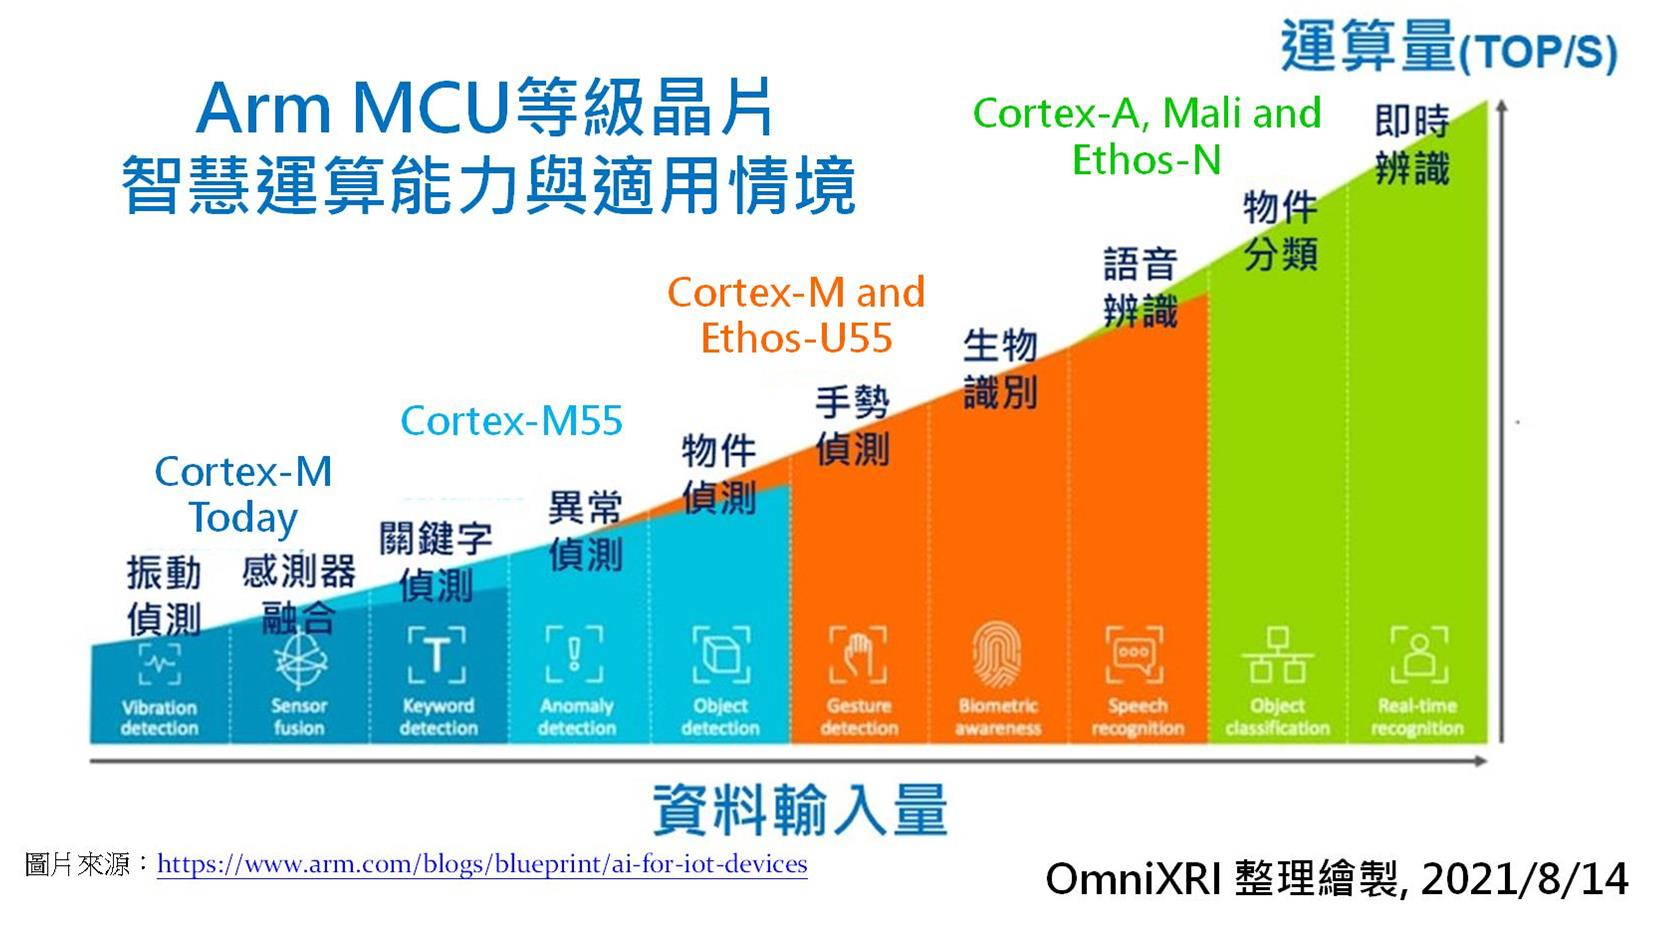 Arm MCU等級晶片智慧運算能力與適用情境